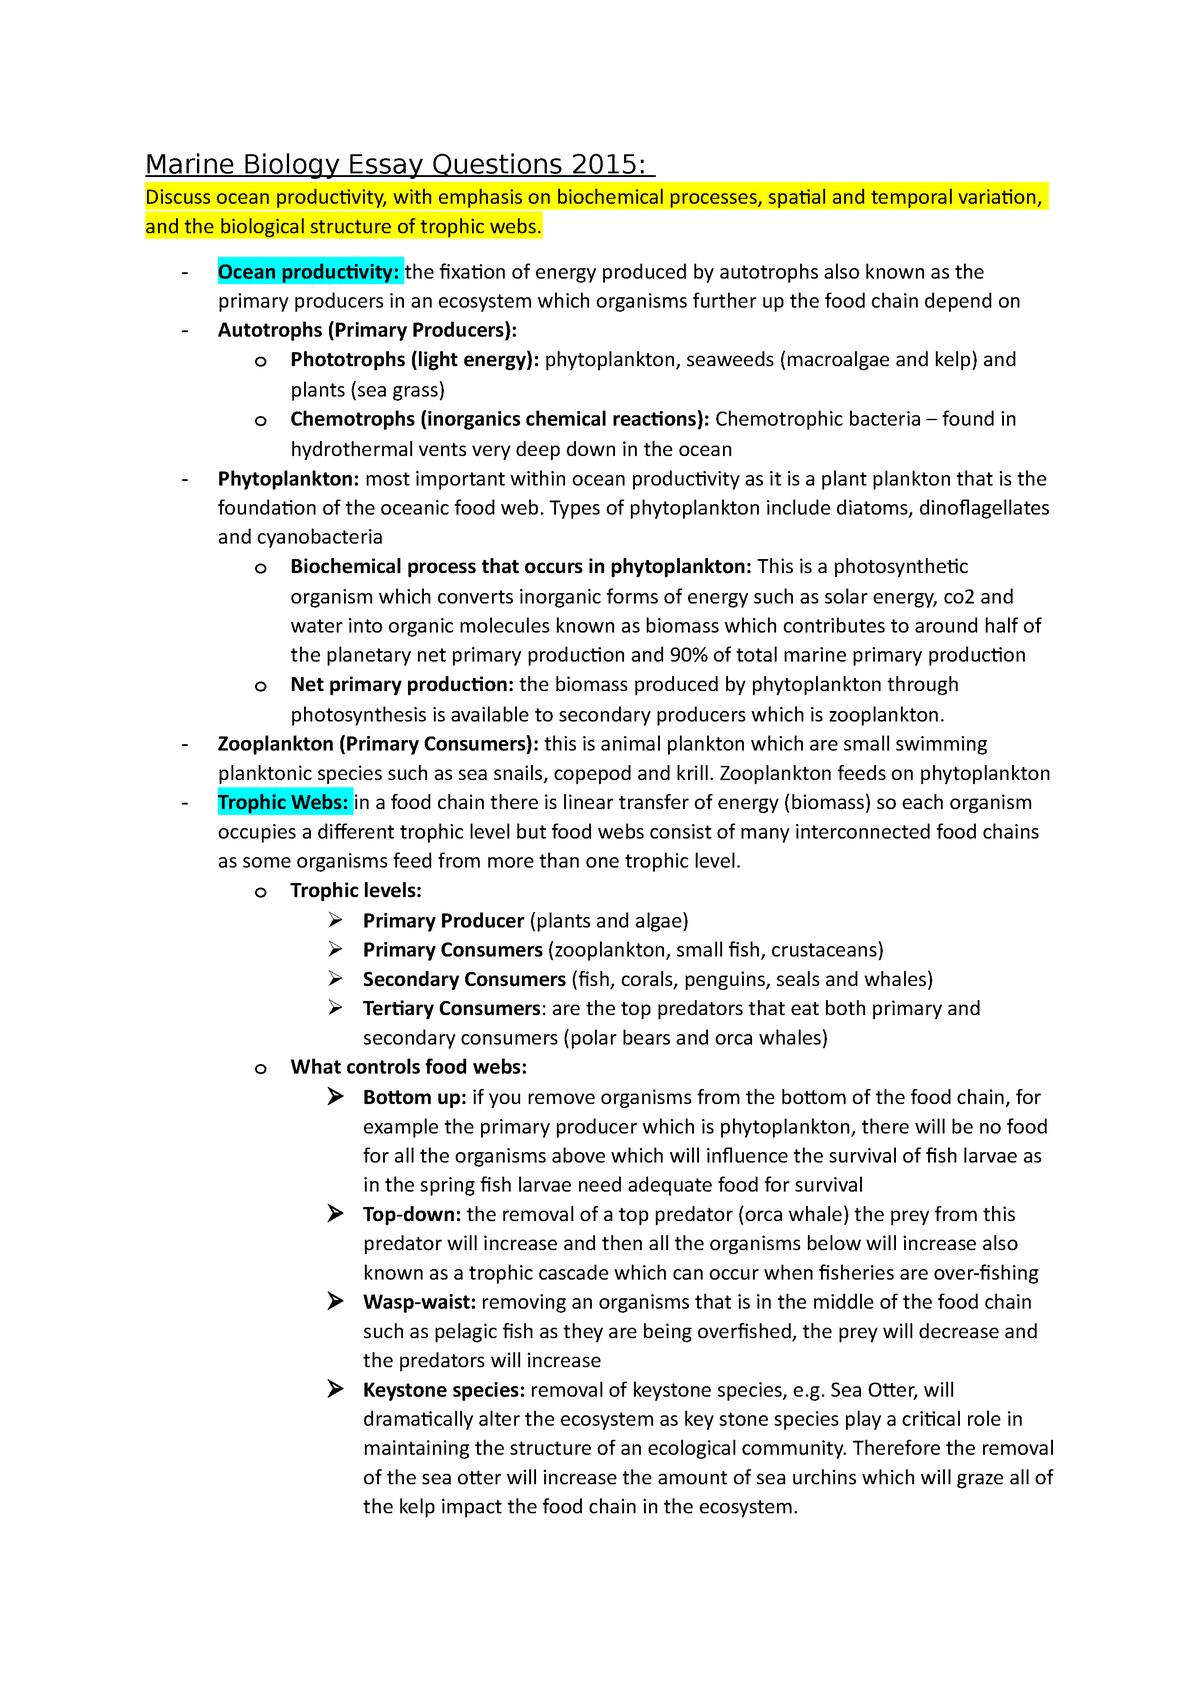 Marine biology essays professional thesis statement proofreading website uk